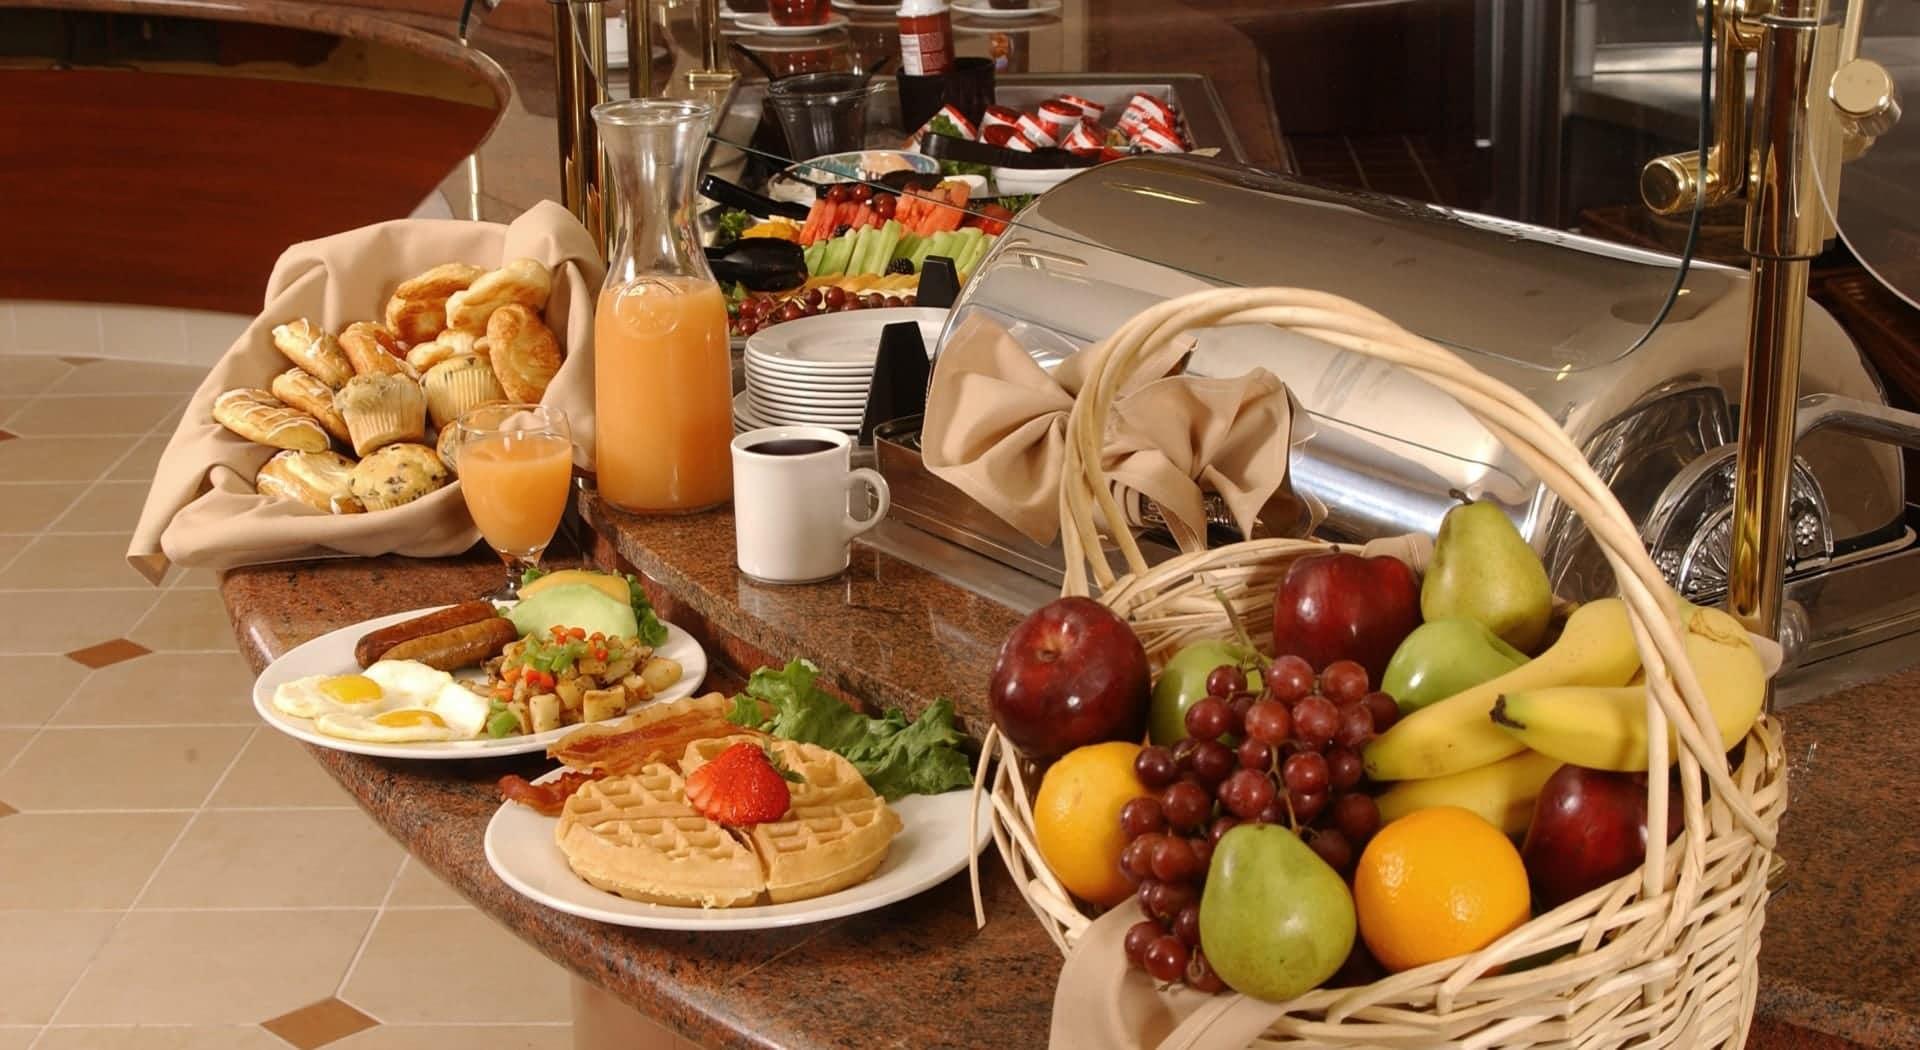 Bjugn breakfast